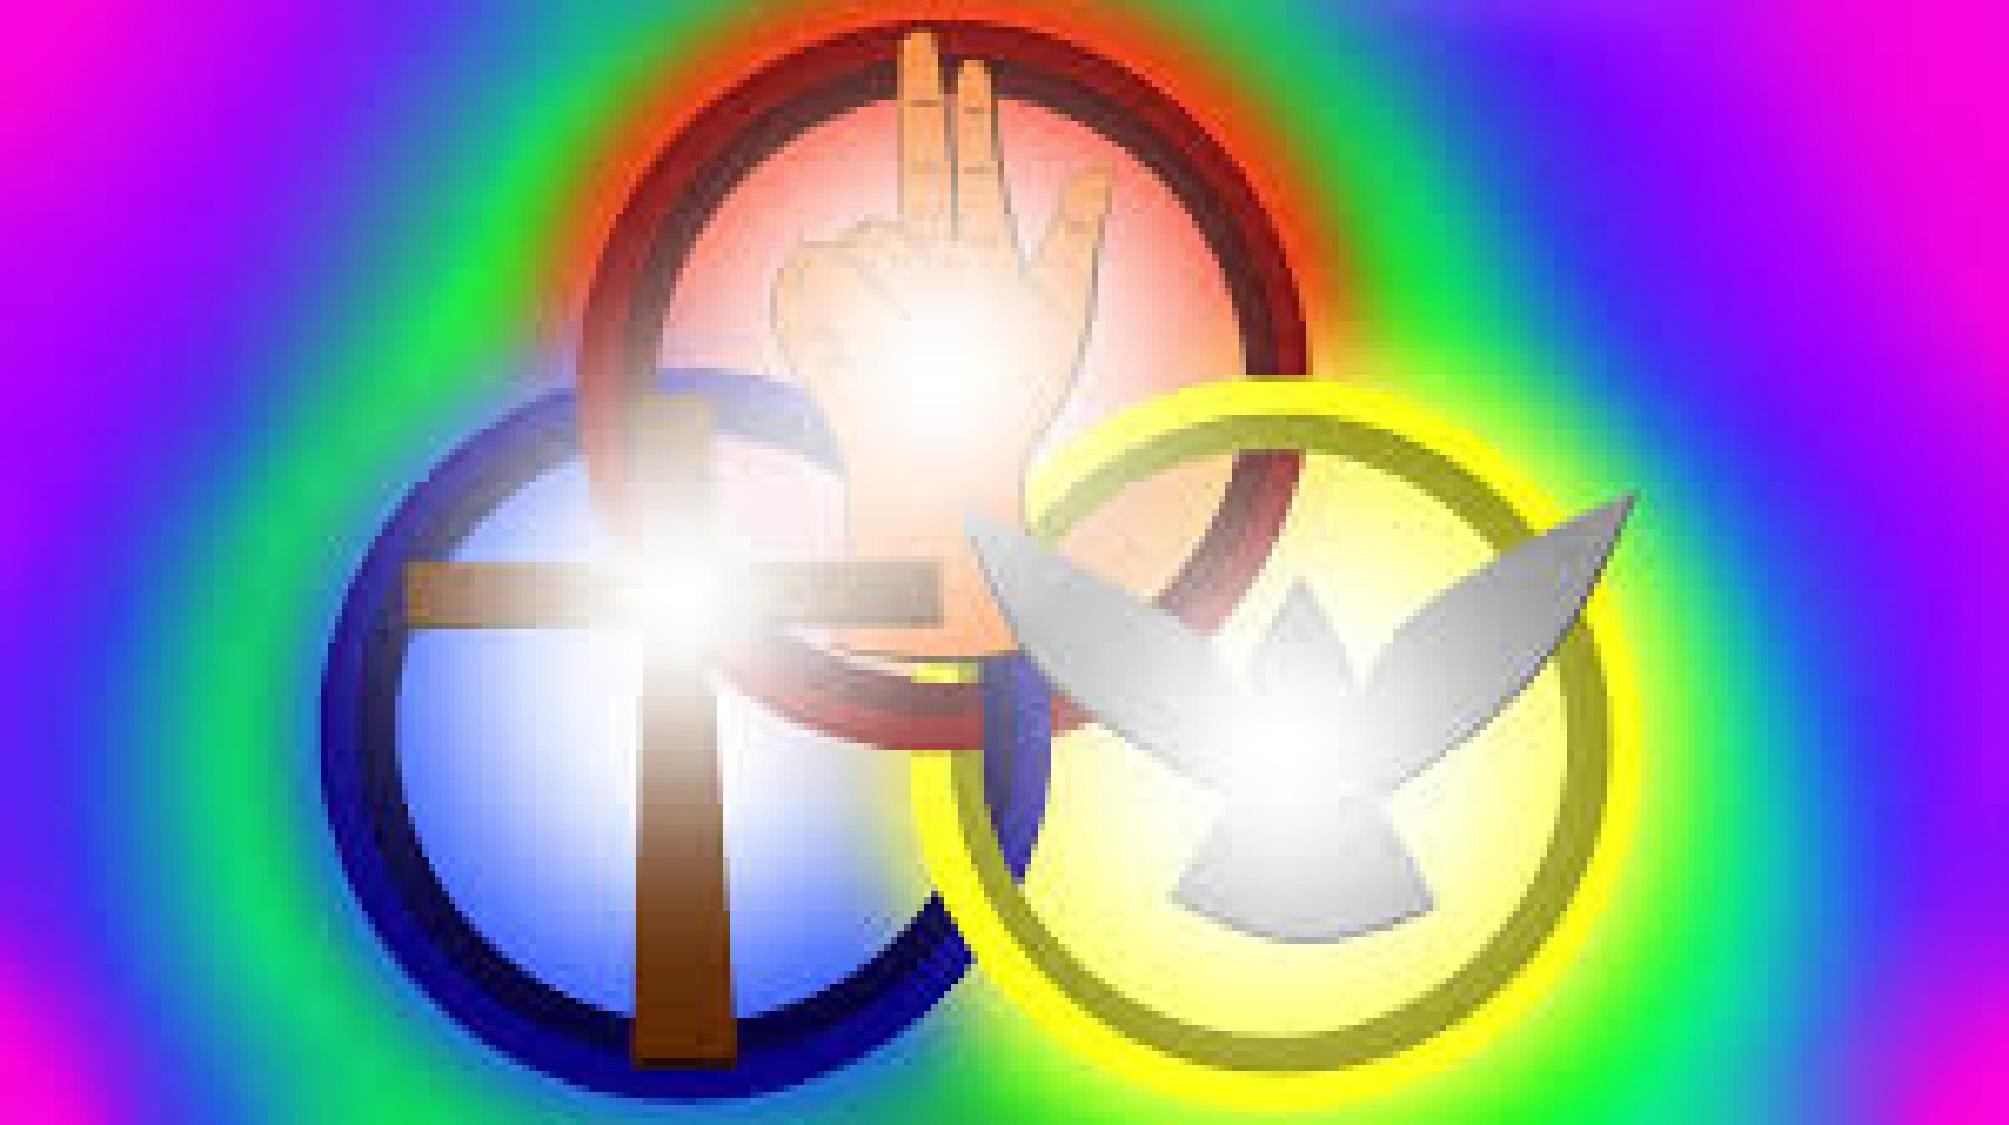 holy trinity Welcome to holy trinity catholic school pre-k - 8th grade.